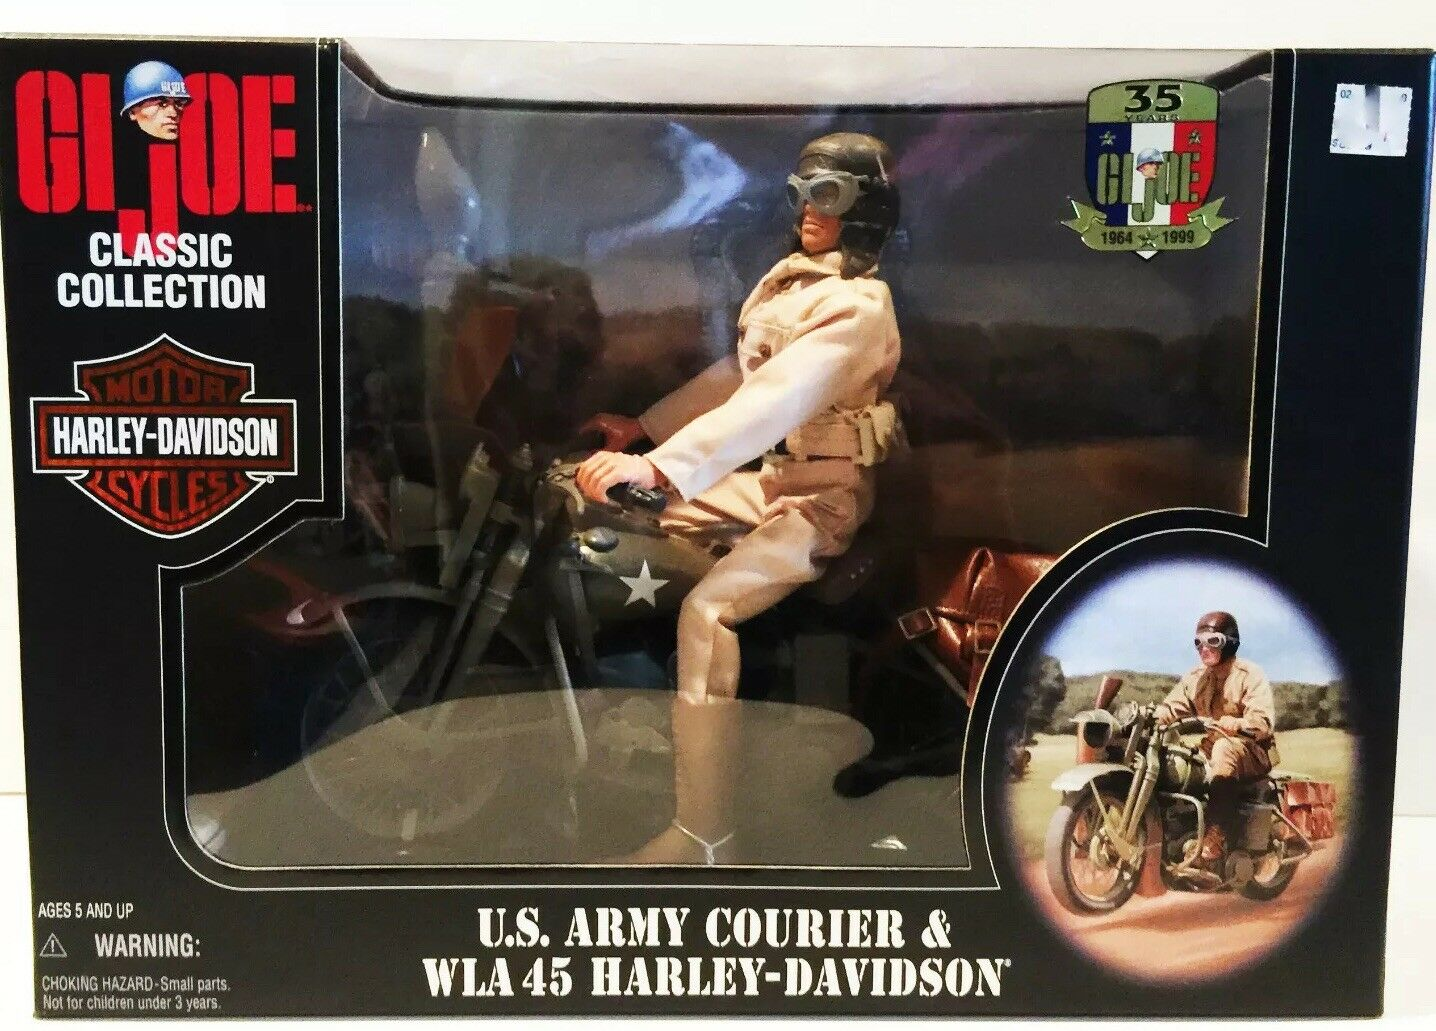 BRAND NEW GI JOE CLASSIC COLLECTION U.S. ARMY COURIER & WLA 45 HARLEY-DAVIDSON